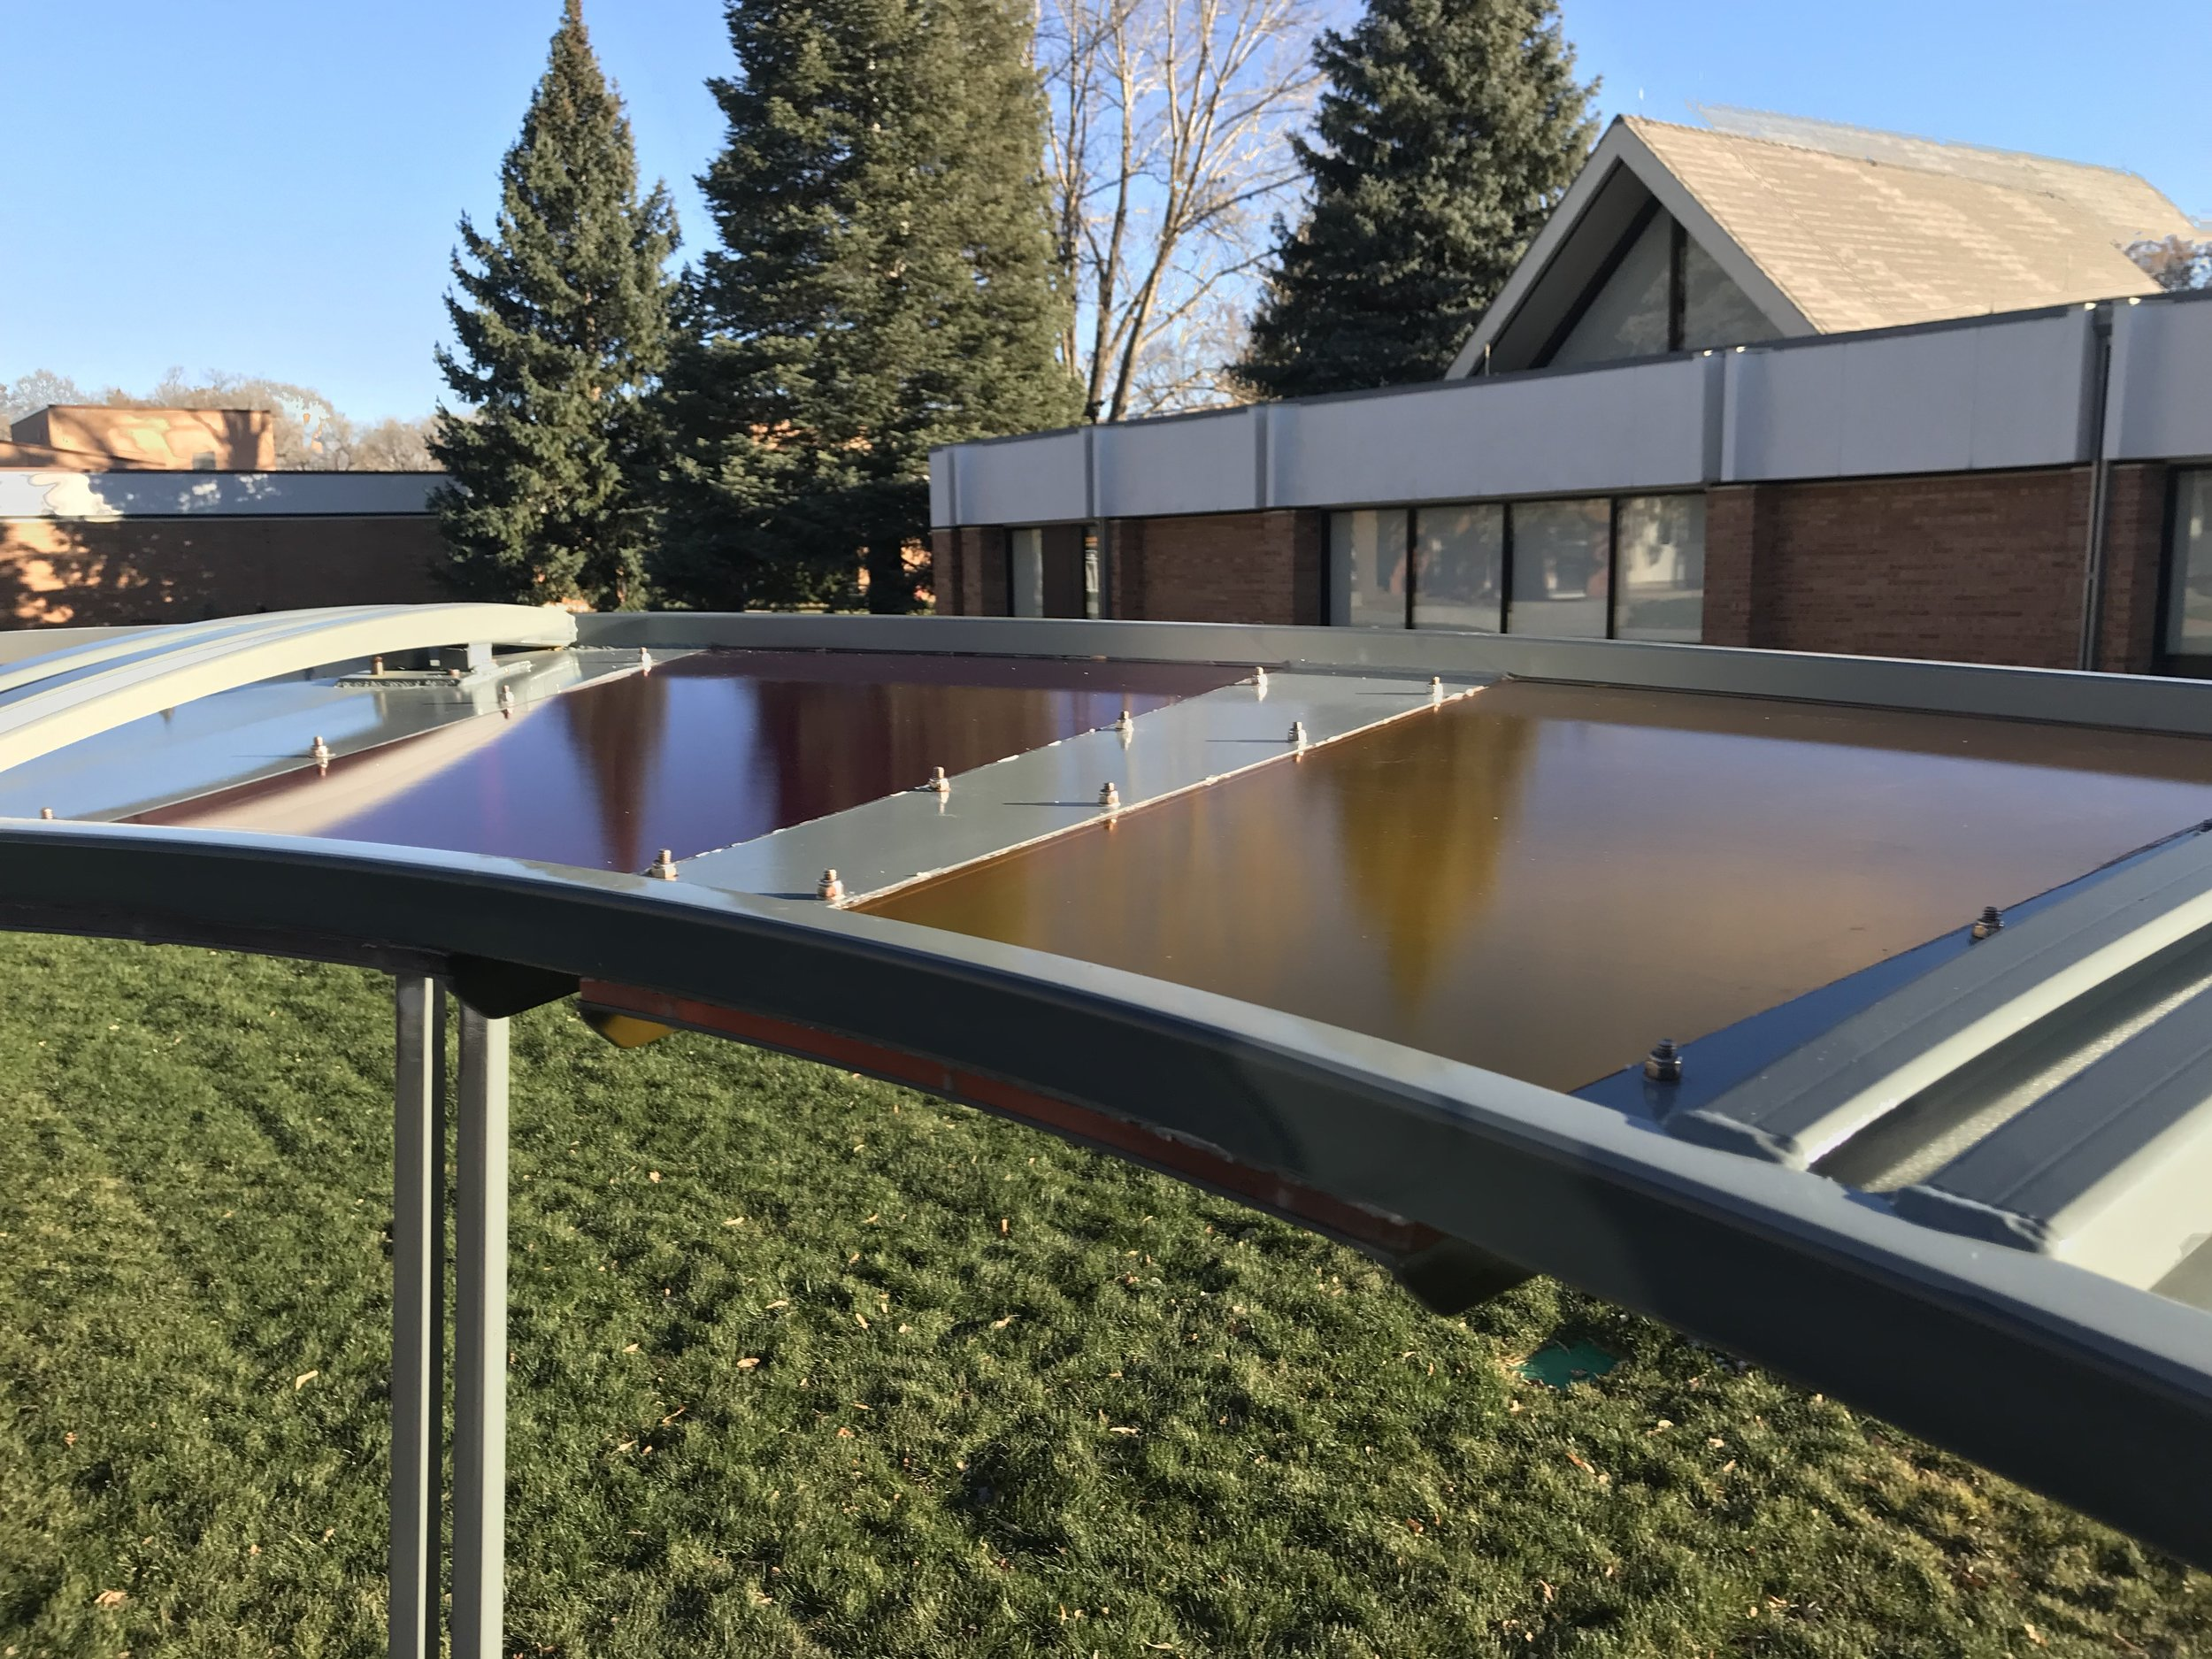 Matthew Geller_Springs_Colorado Springs_Public Art Services_J Grant Projects_15.JPG